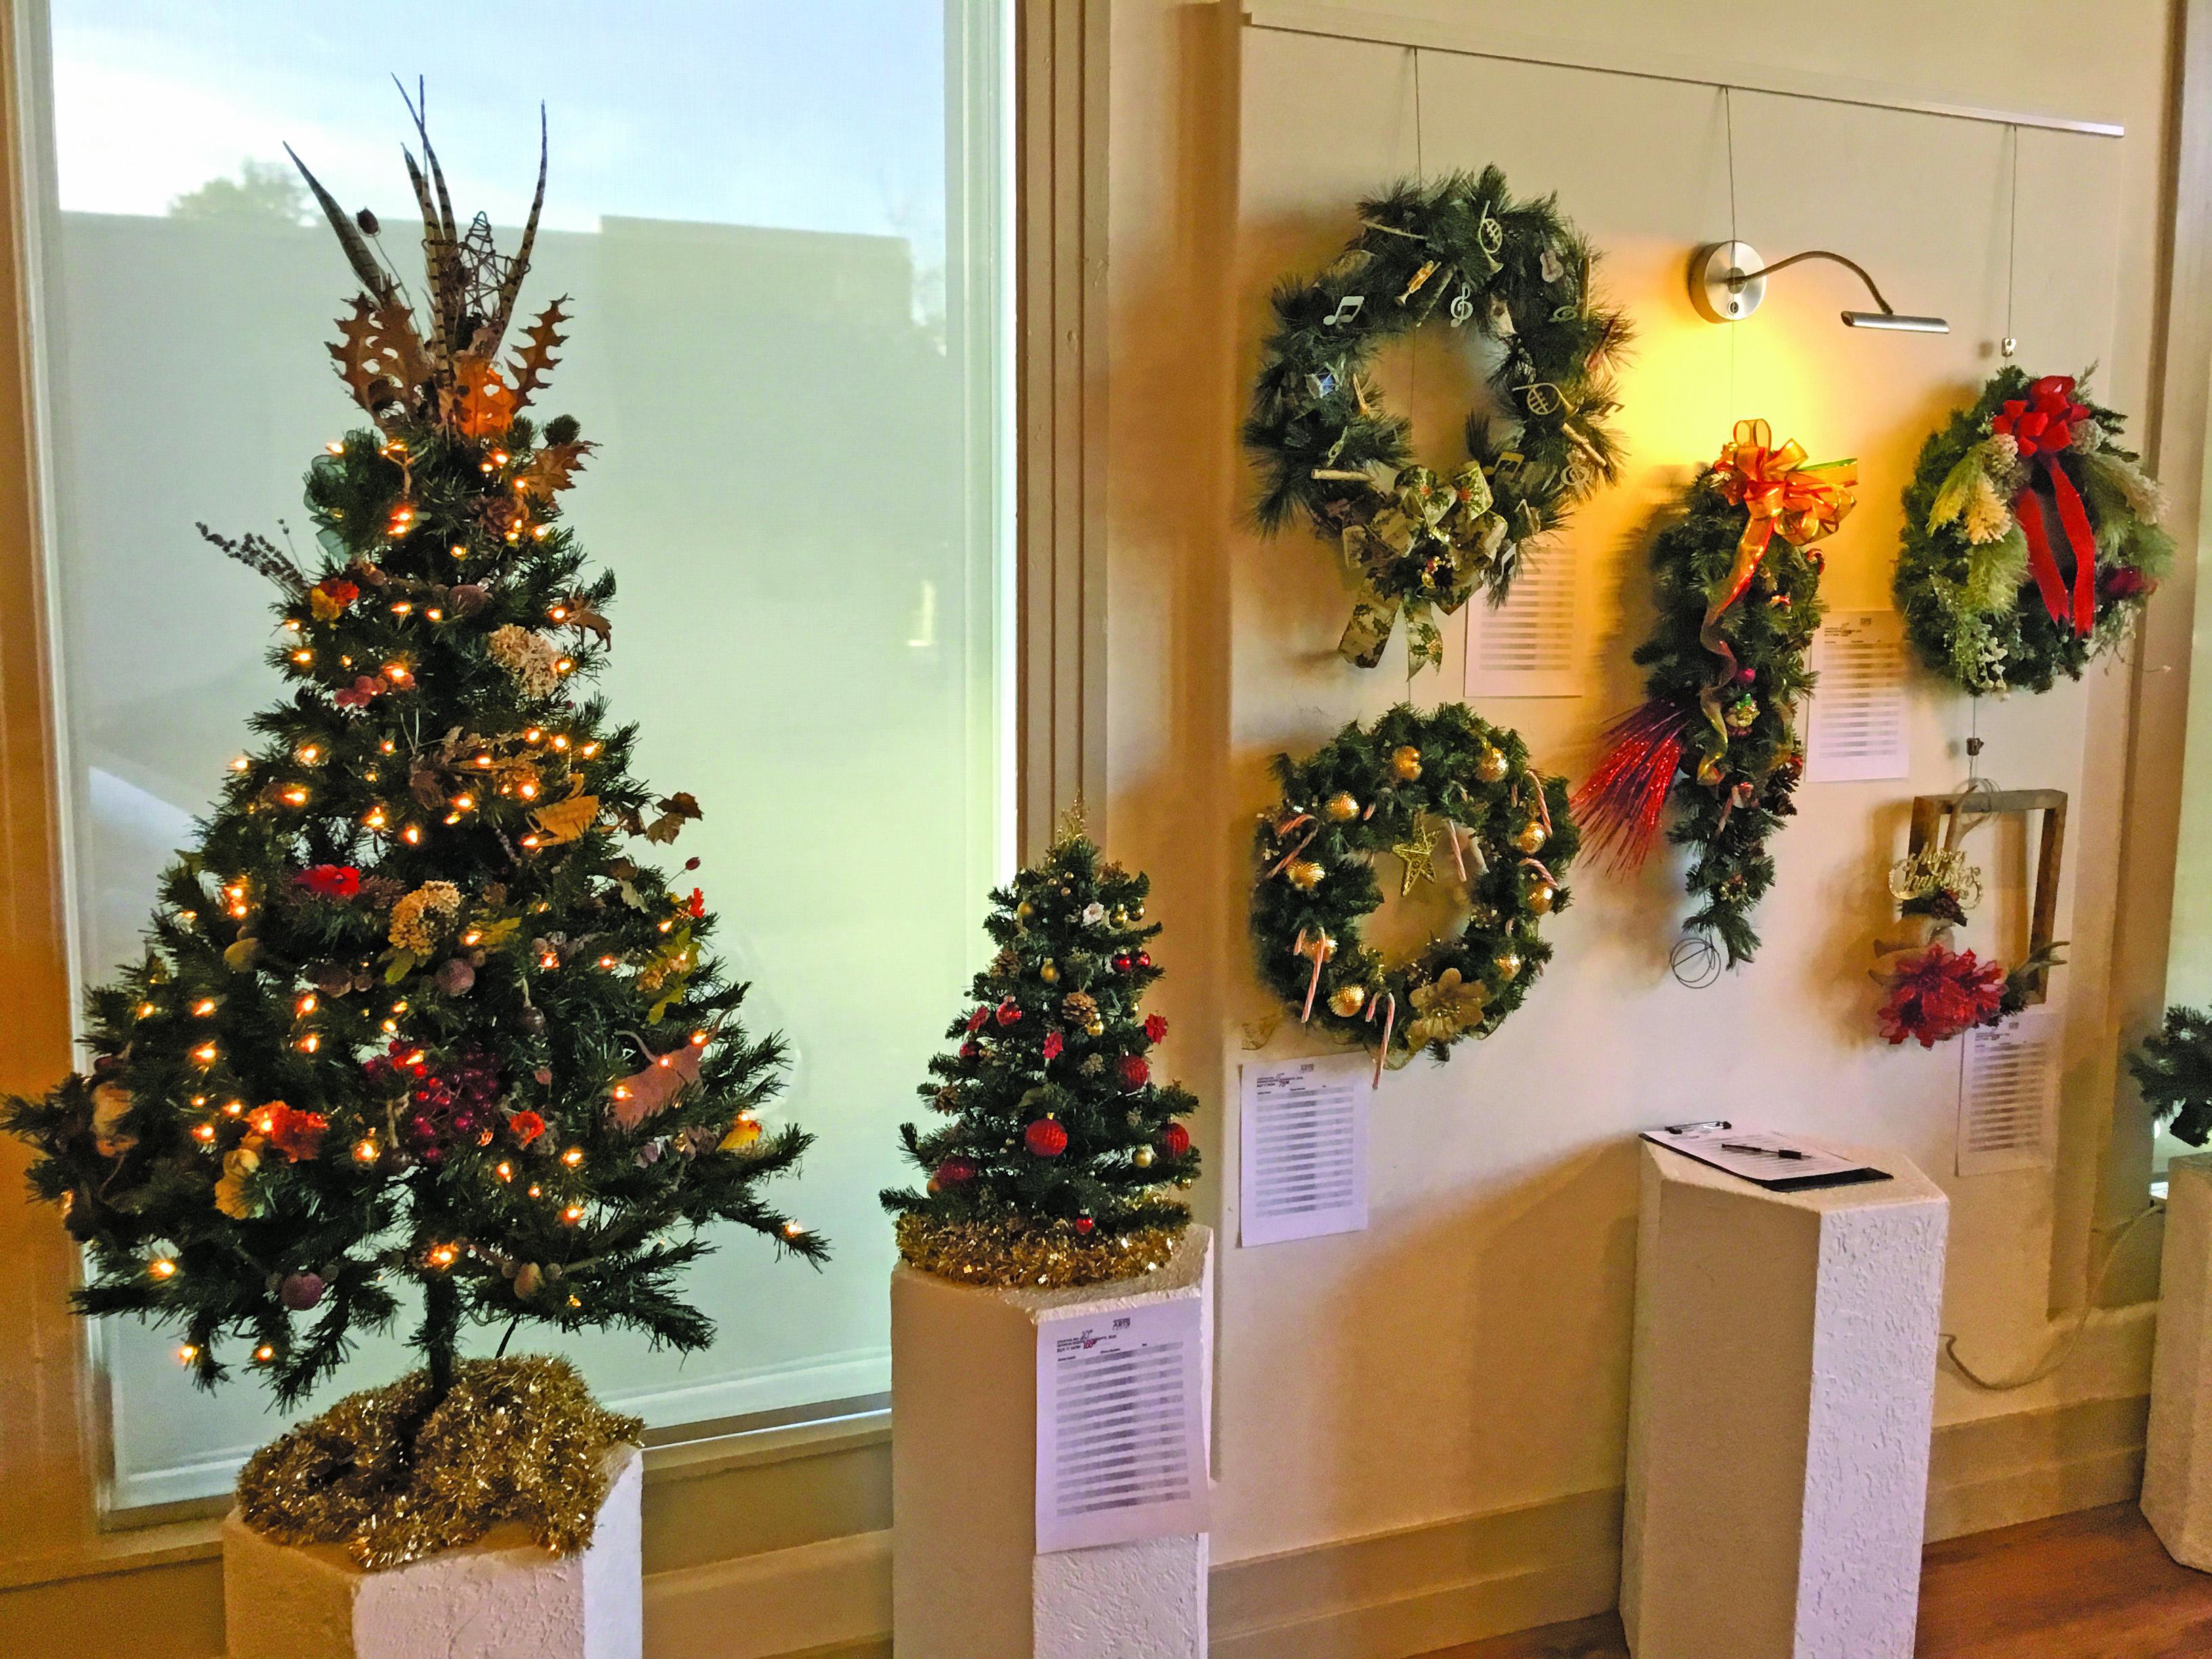 Christmas Wreaths and